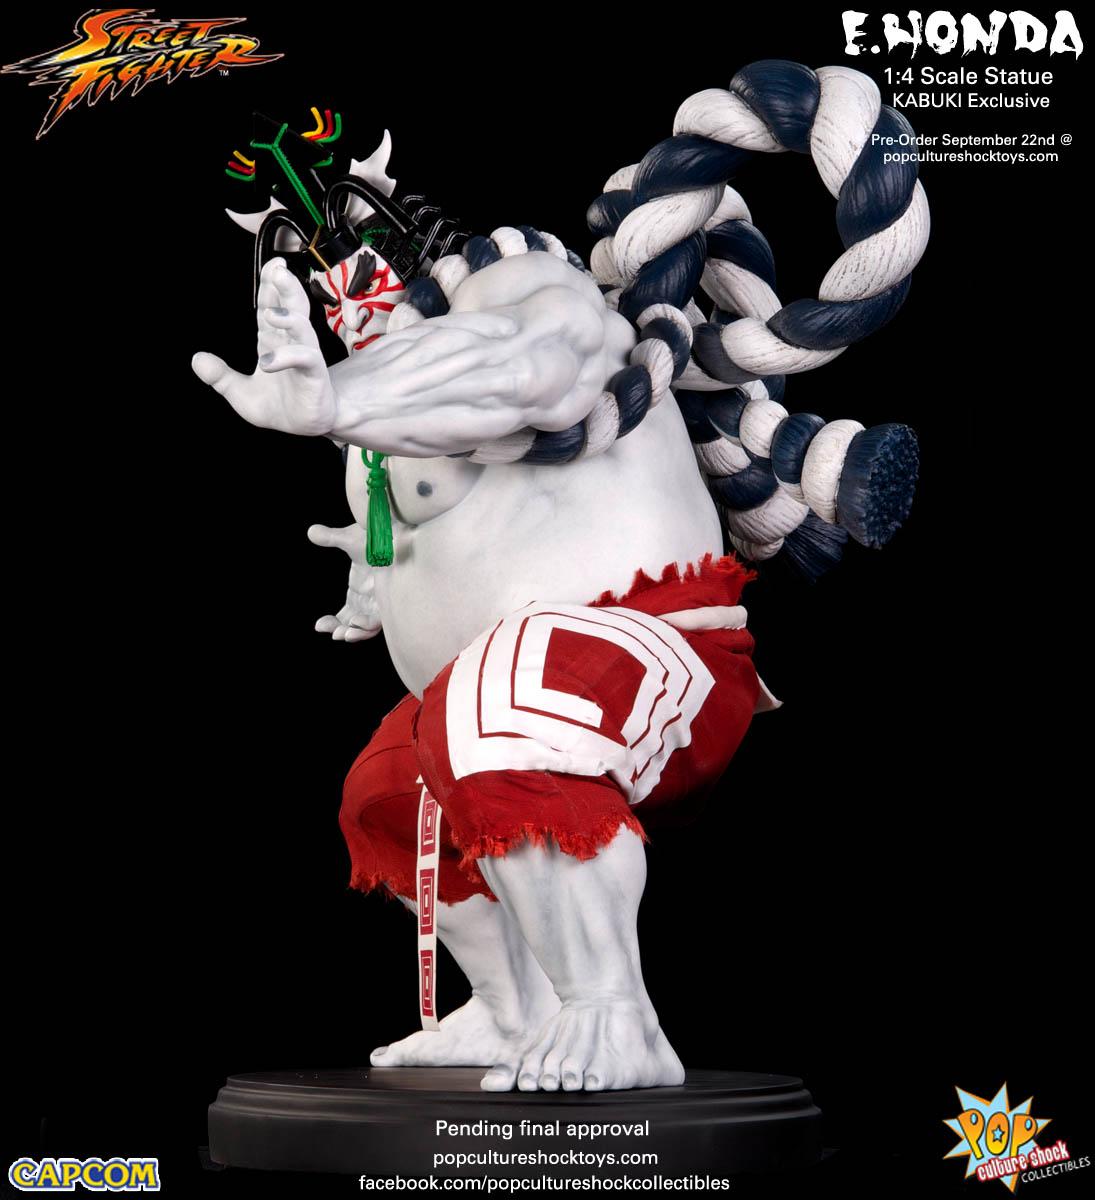 [Pop Culture Shock] Street Fighter: E. Honda 1/4 Statue - Página 3 Street-Fighter-E.-Honda-Kabuki-Statue-005